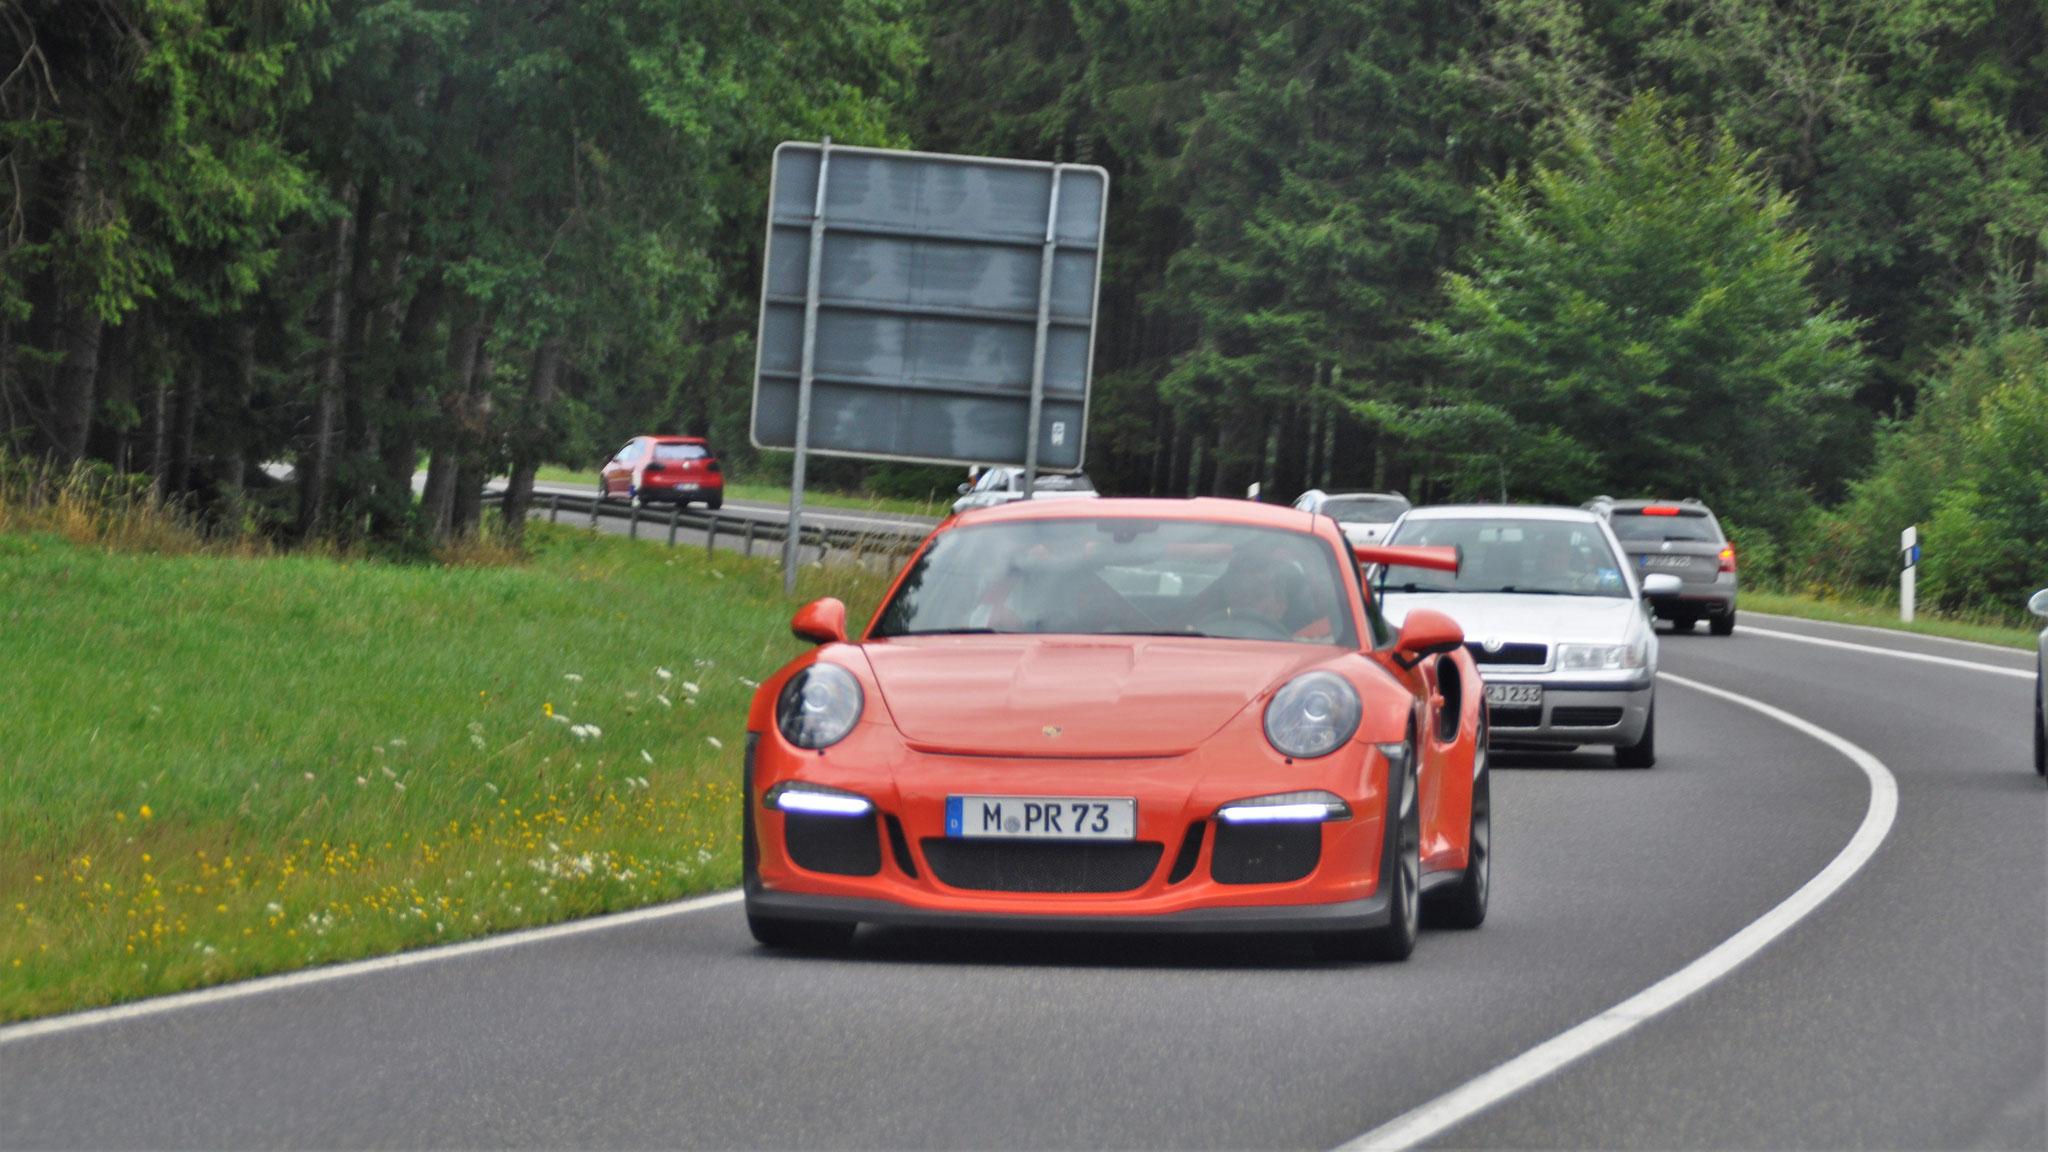 Porsche 911 GT3 RS - M-PR-73